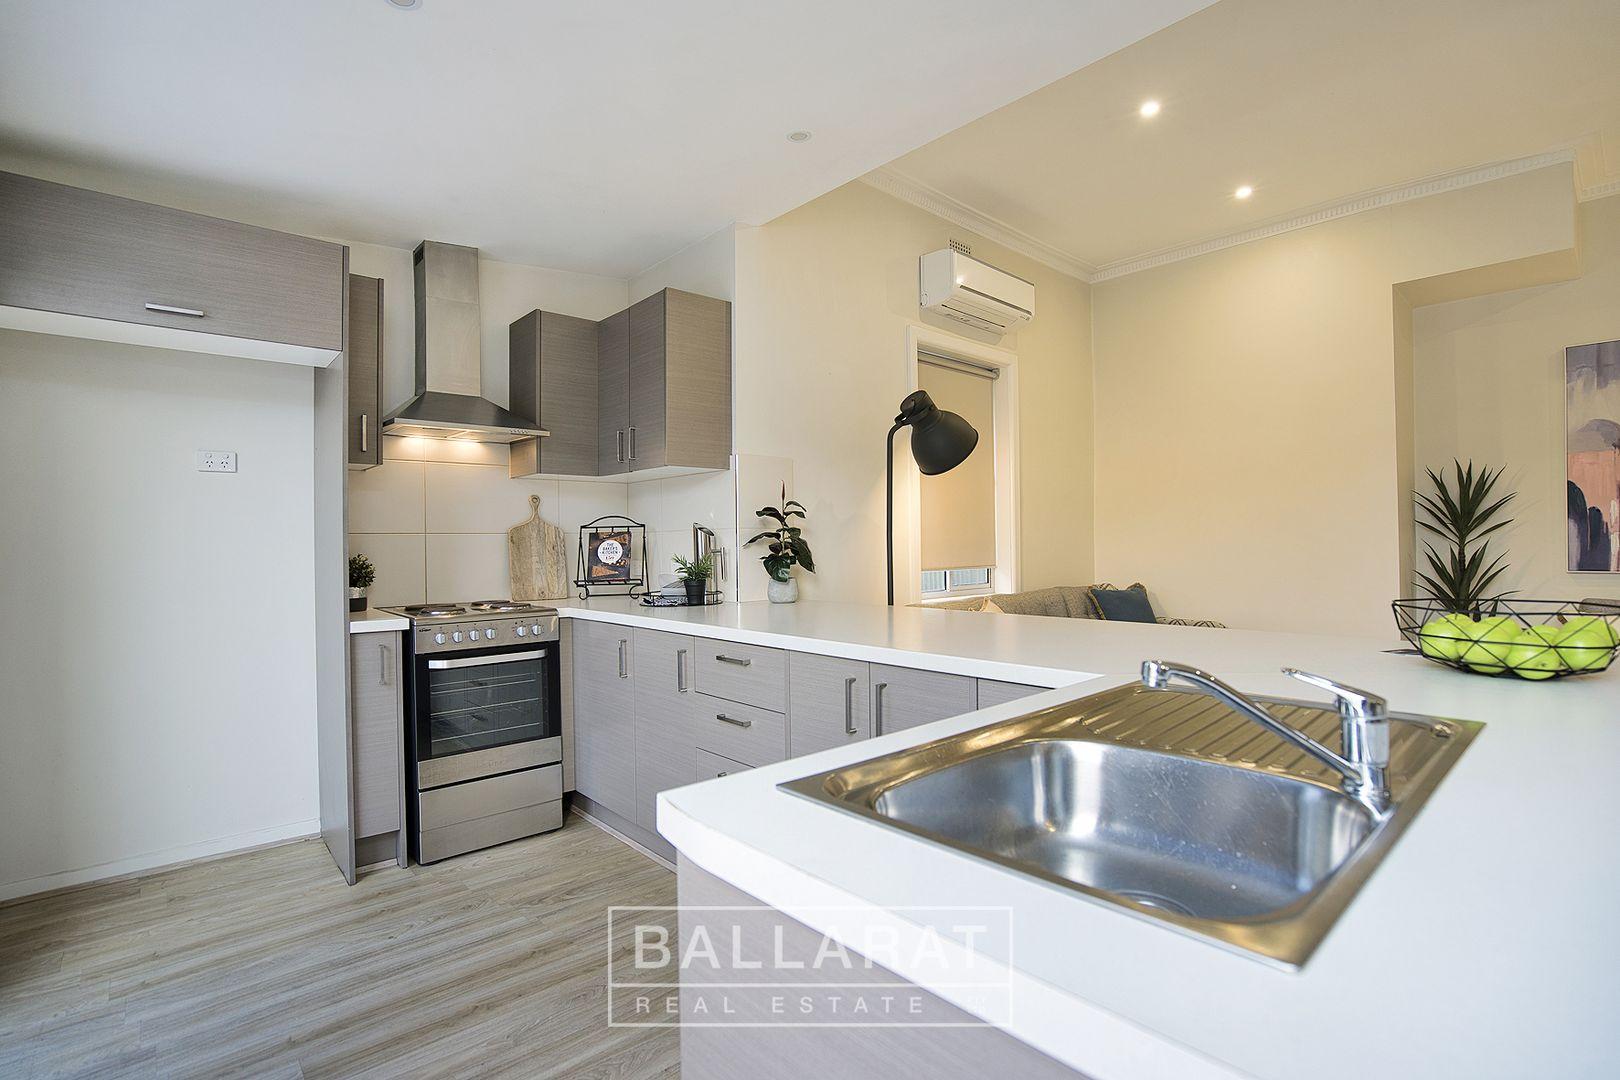 207 Nelson Street, Ballarat East VIC 3350, Image 2